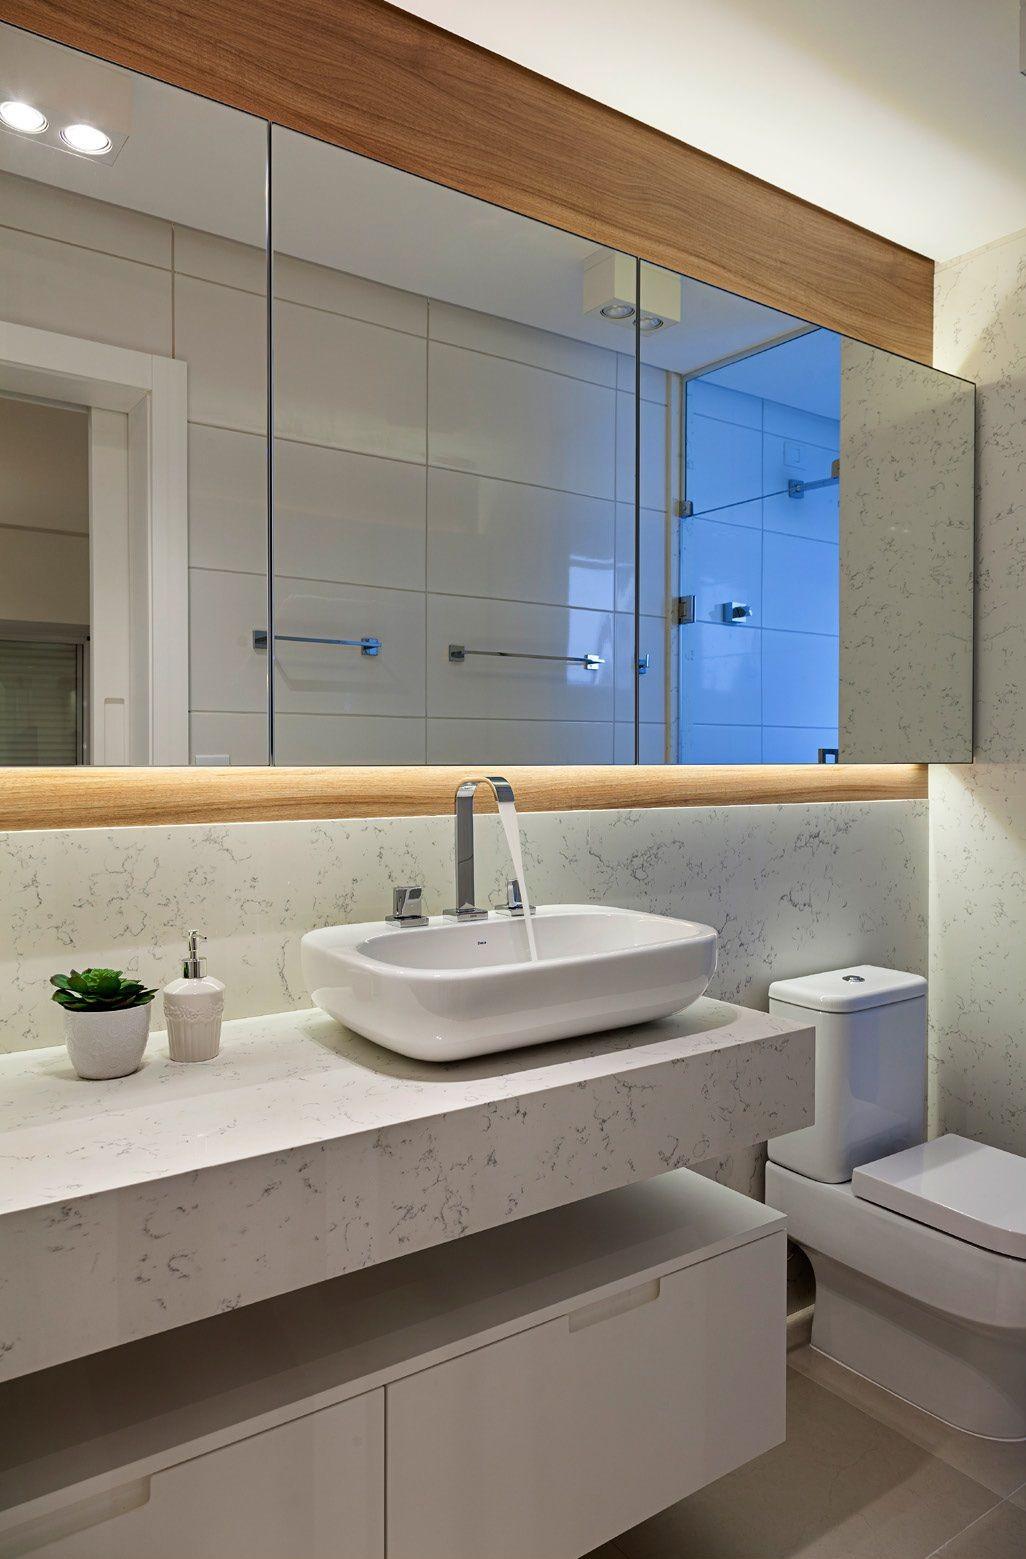 COZINHAS - Apartamento Menegat-IRIS SCHMITT ARQUITETURA